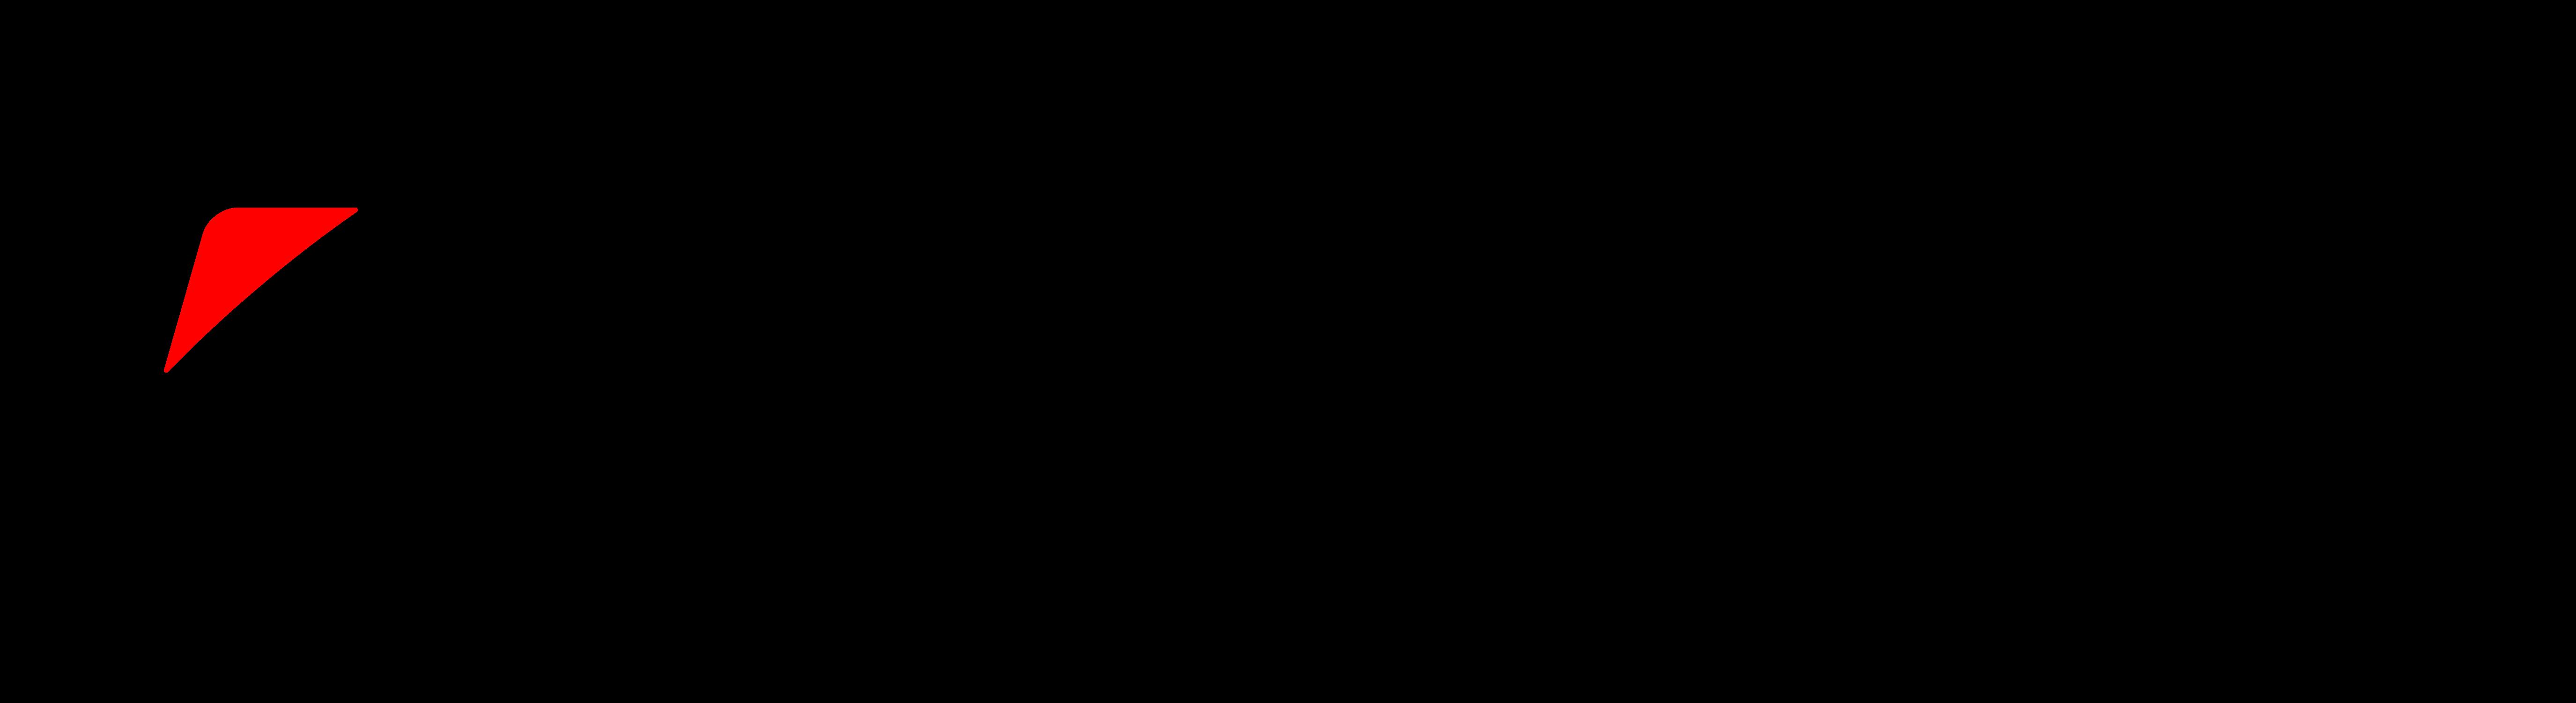 Bridgestone EMEA Logo